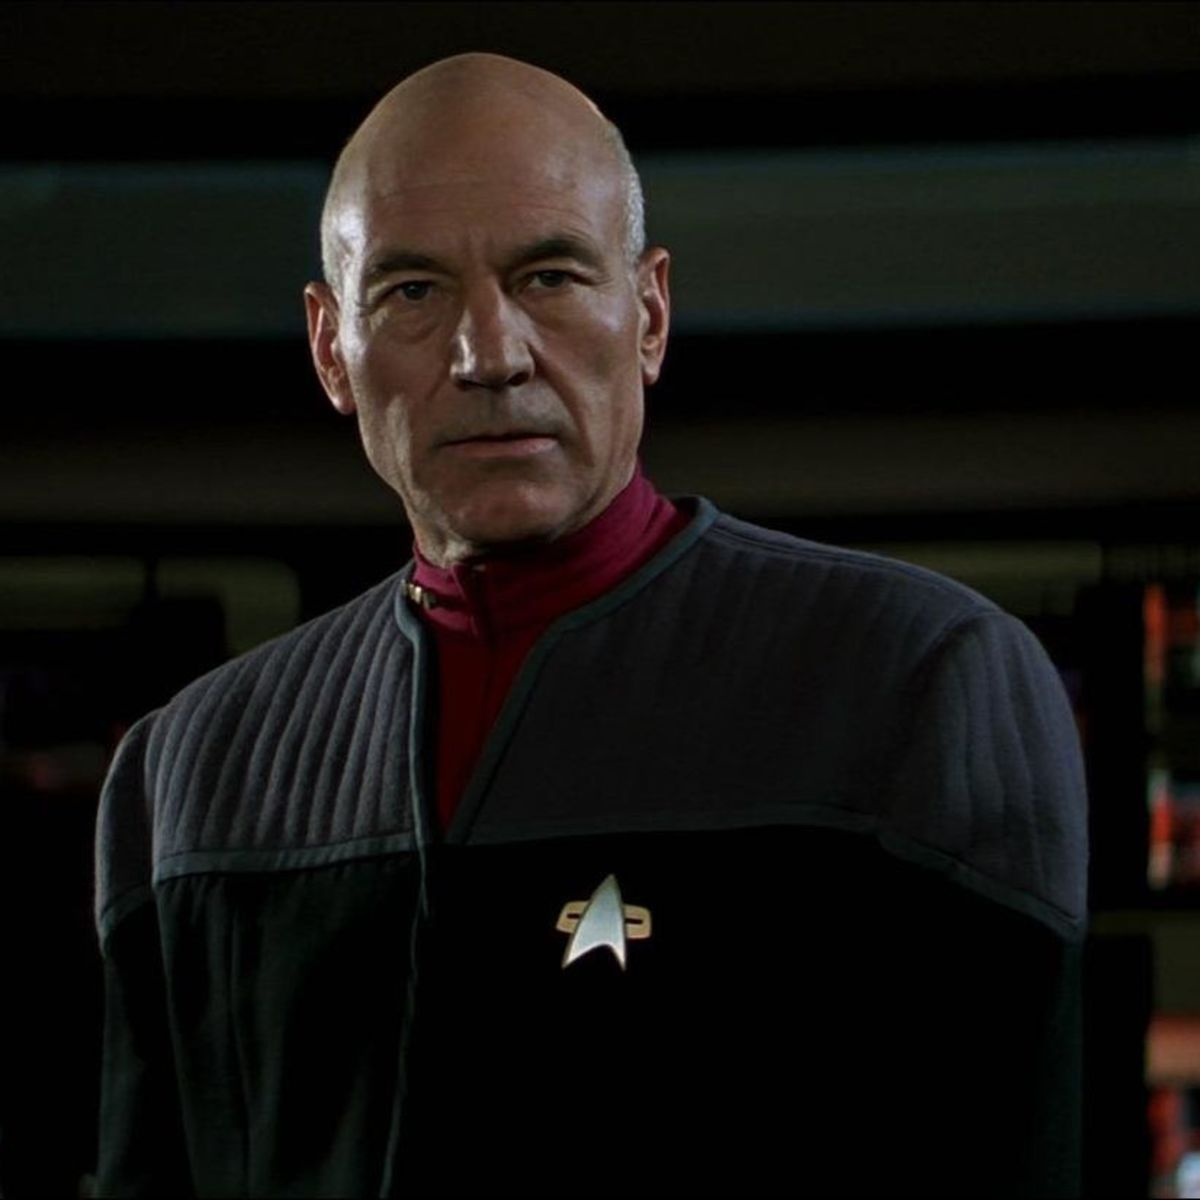 Patrick Stewart Says He'd Play Star Trek's Capt. Jean-Luc